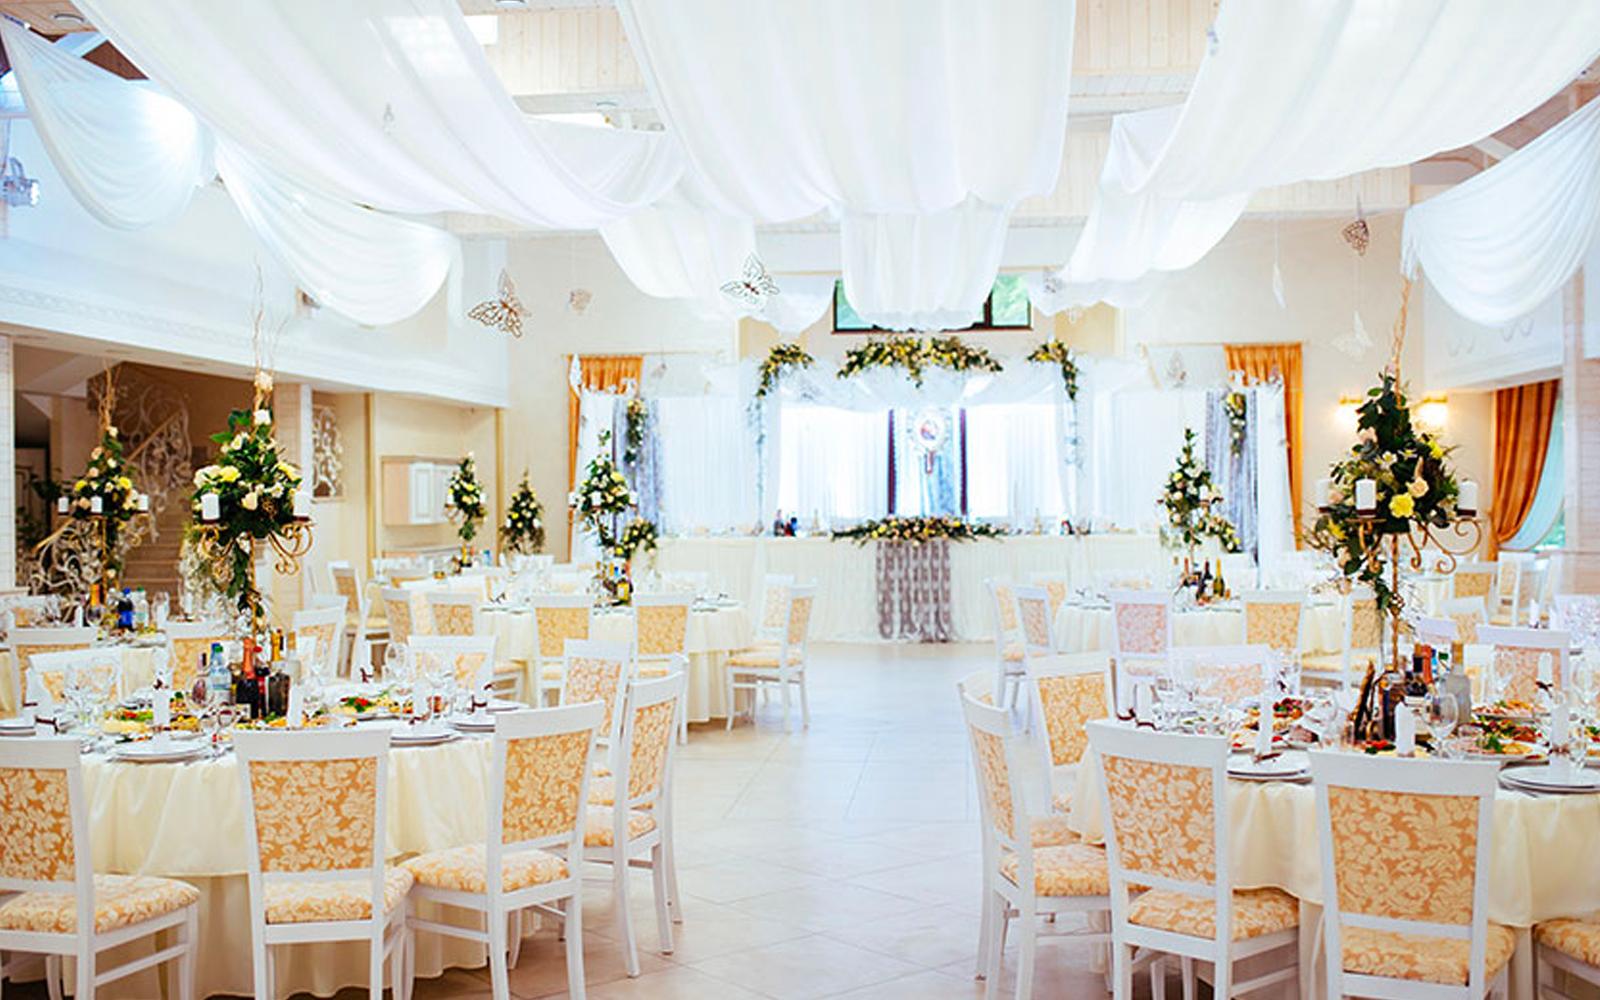 Best Wedding Caterer On Long Island